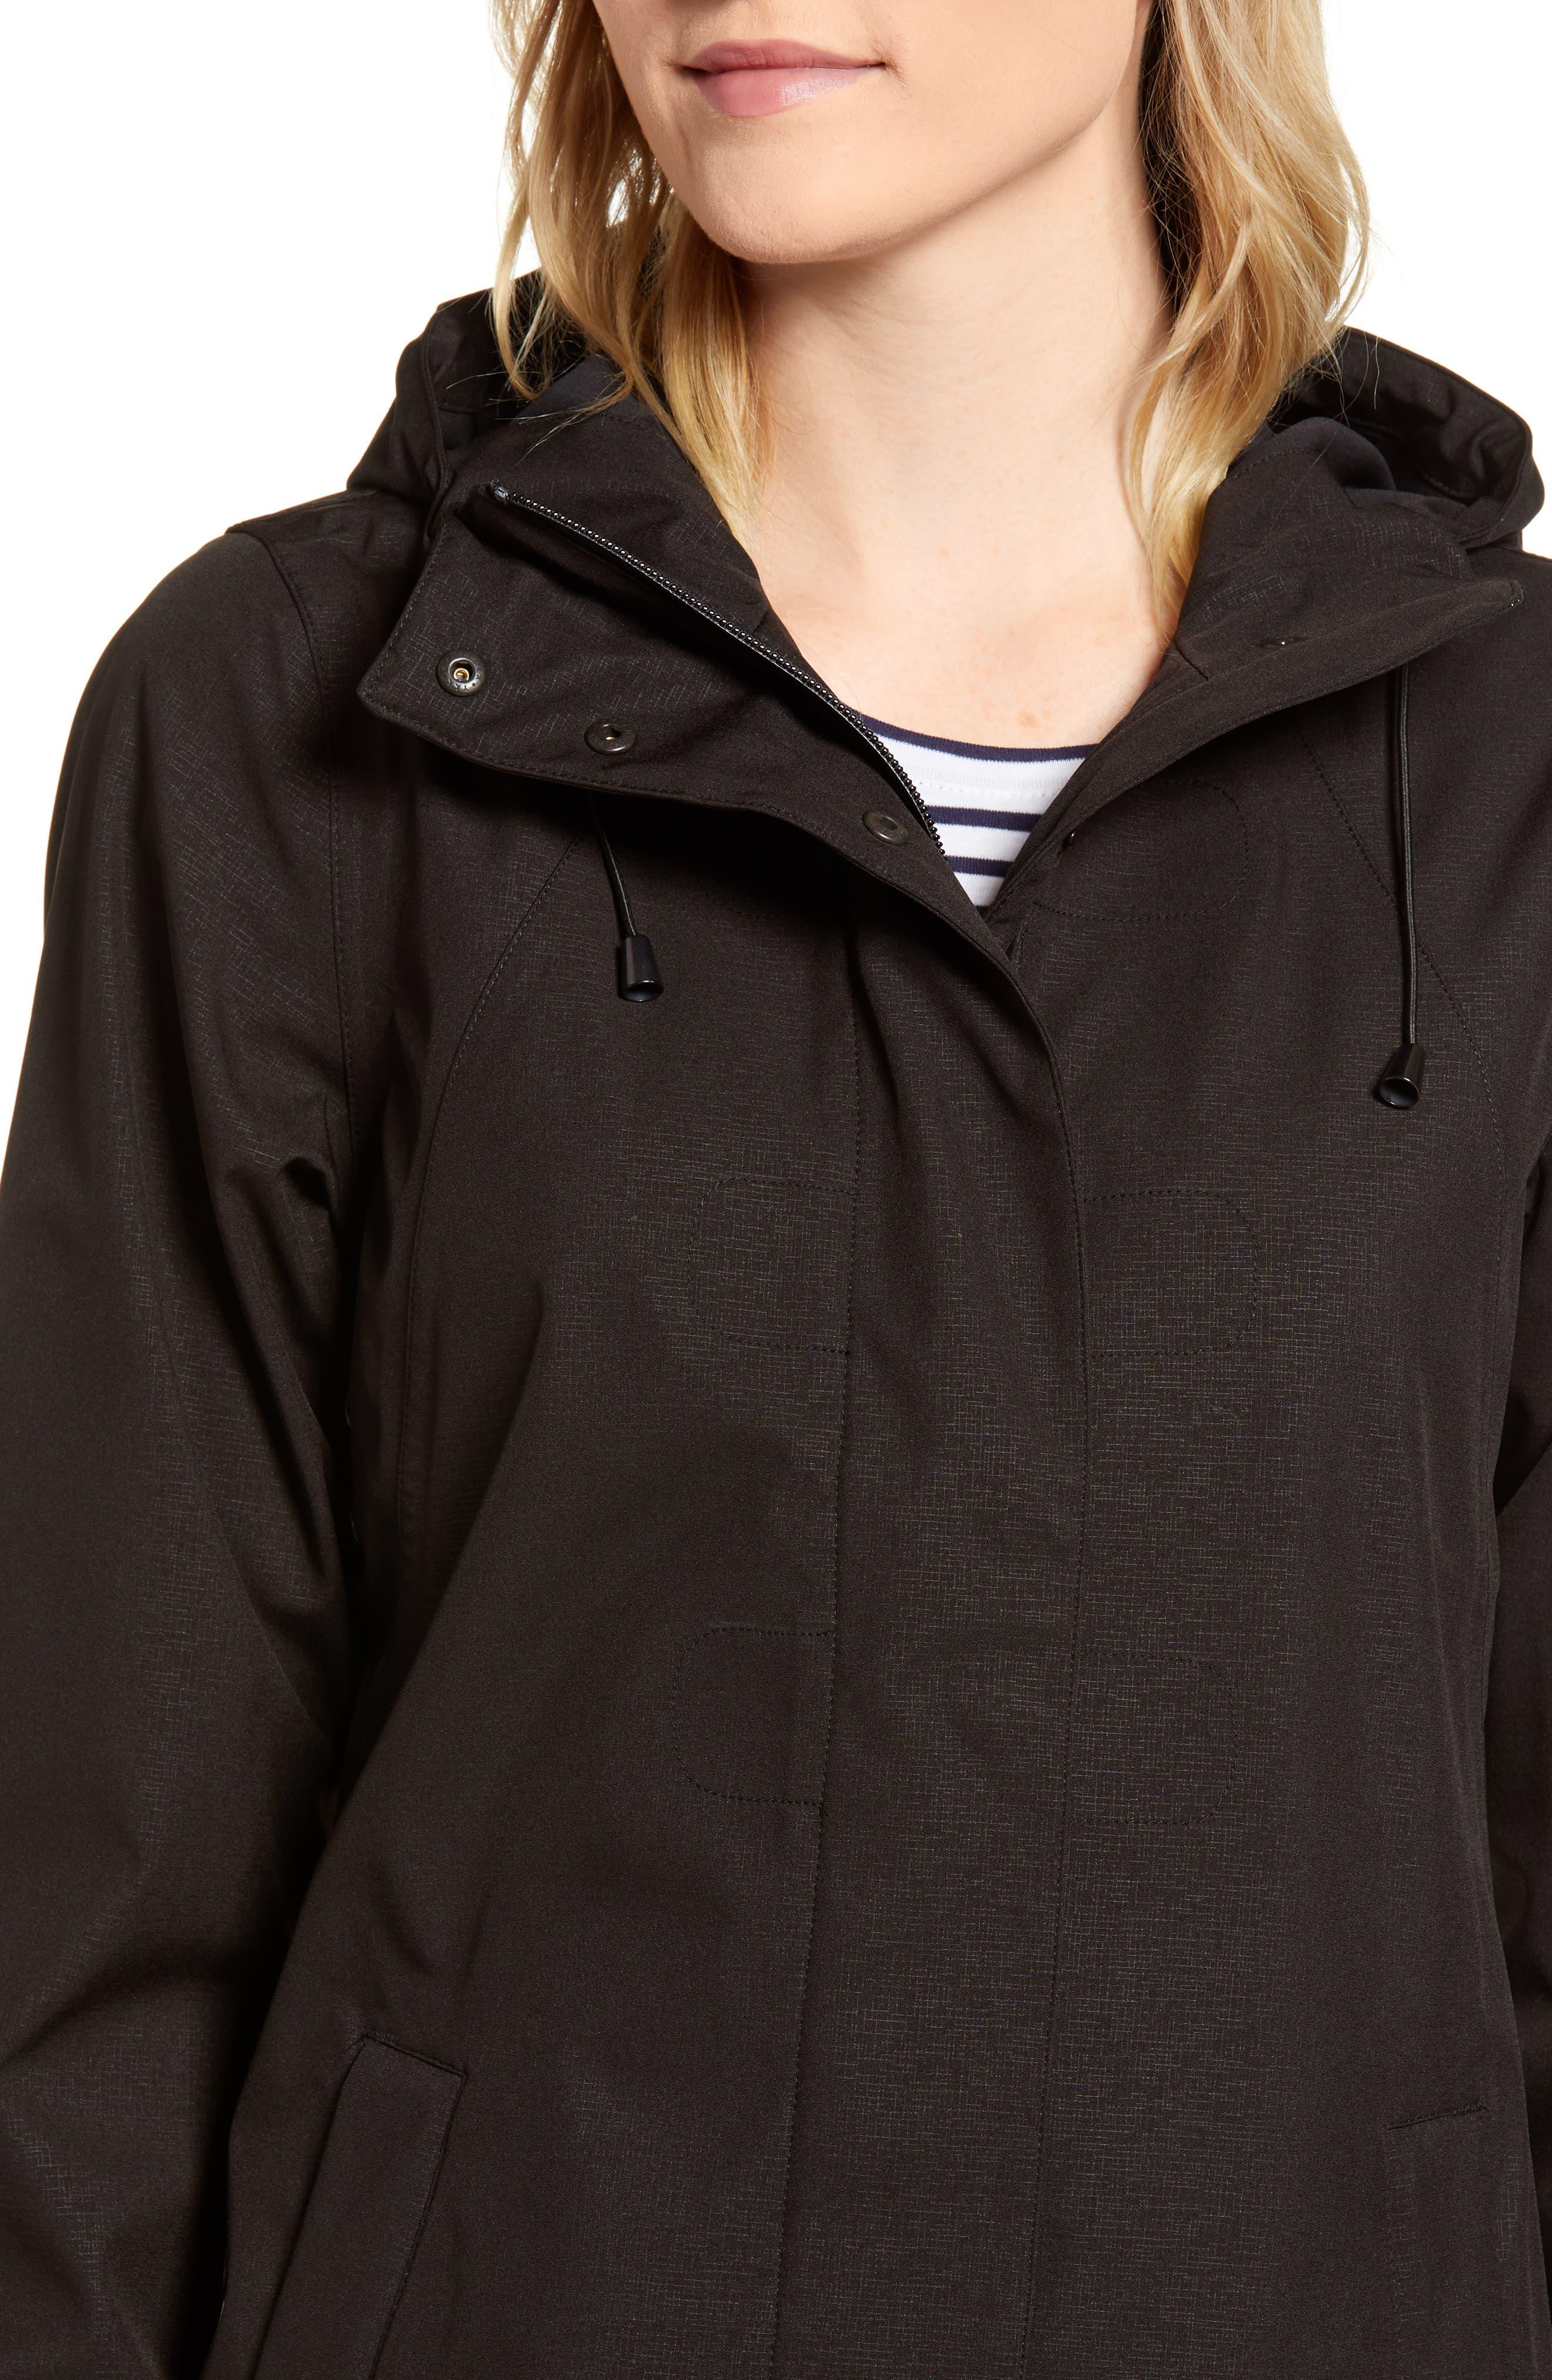 Soft Shell Raincoat,                             Alternate thumbnail 4, color,                             Black